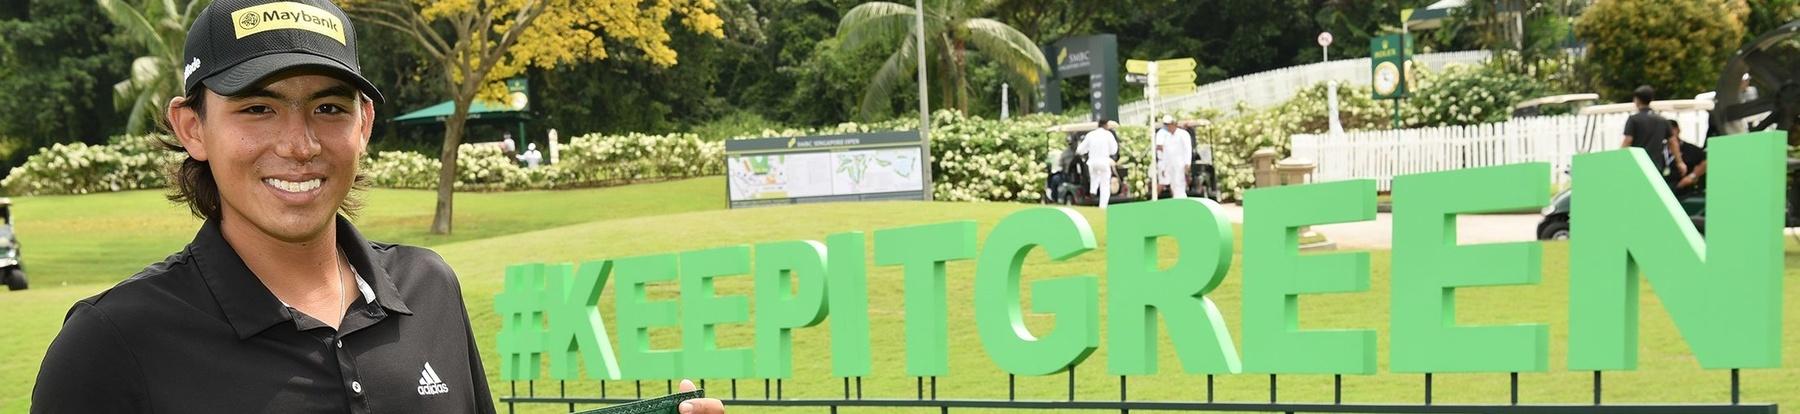 Gavin Green Launches Sentosa Golf Club's #KeepItGreen Campaign at SMBC Singapore Open